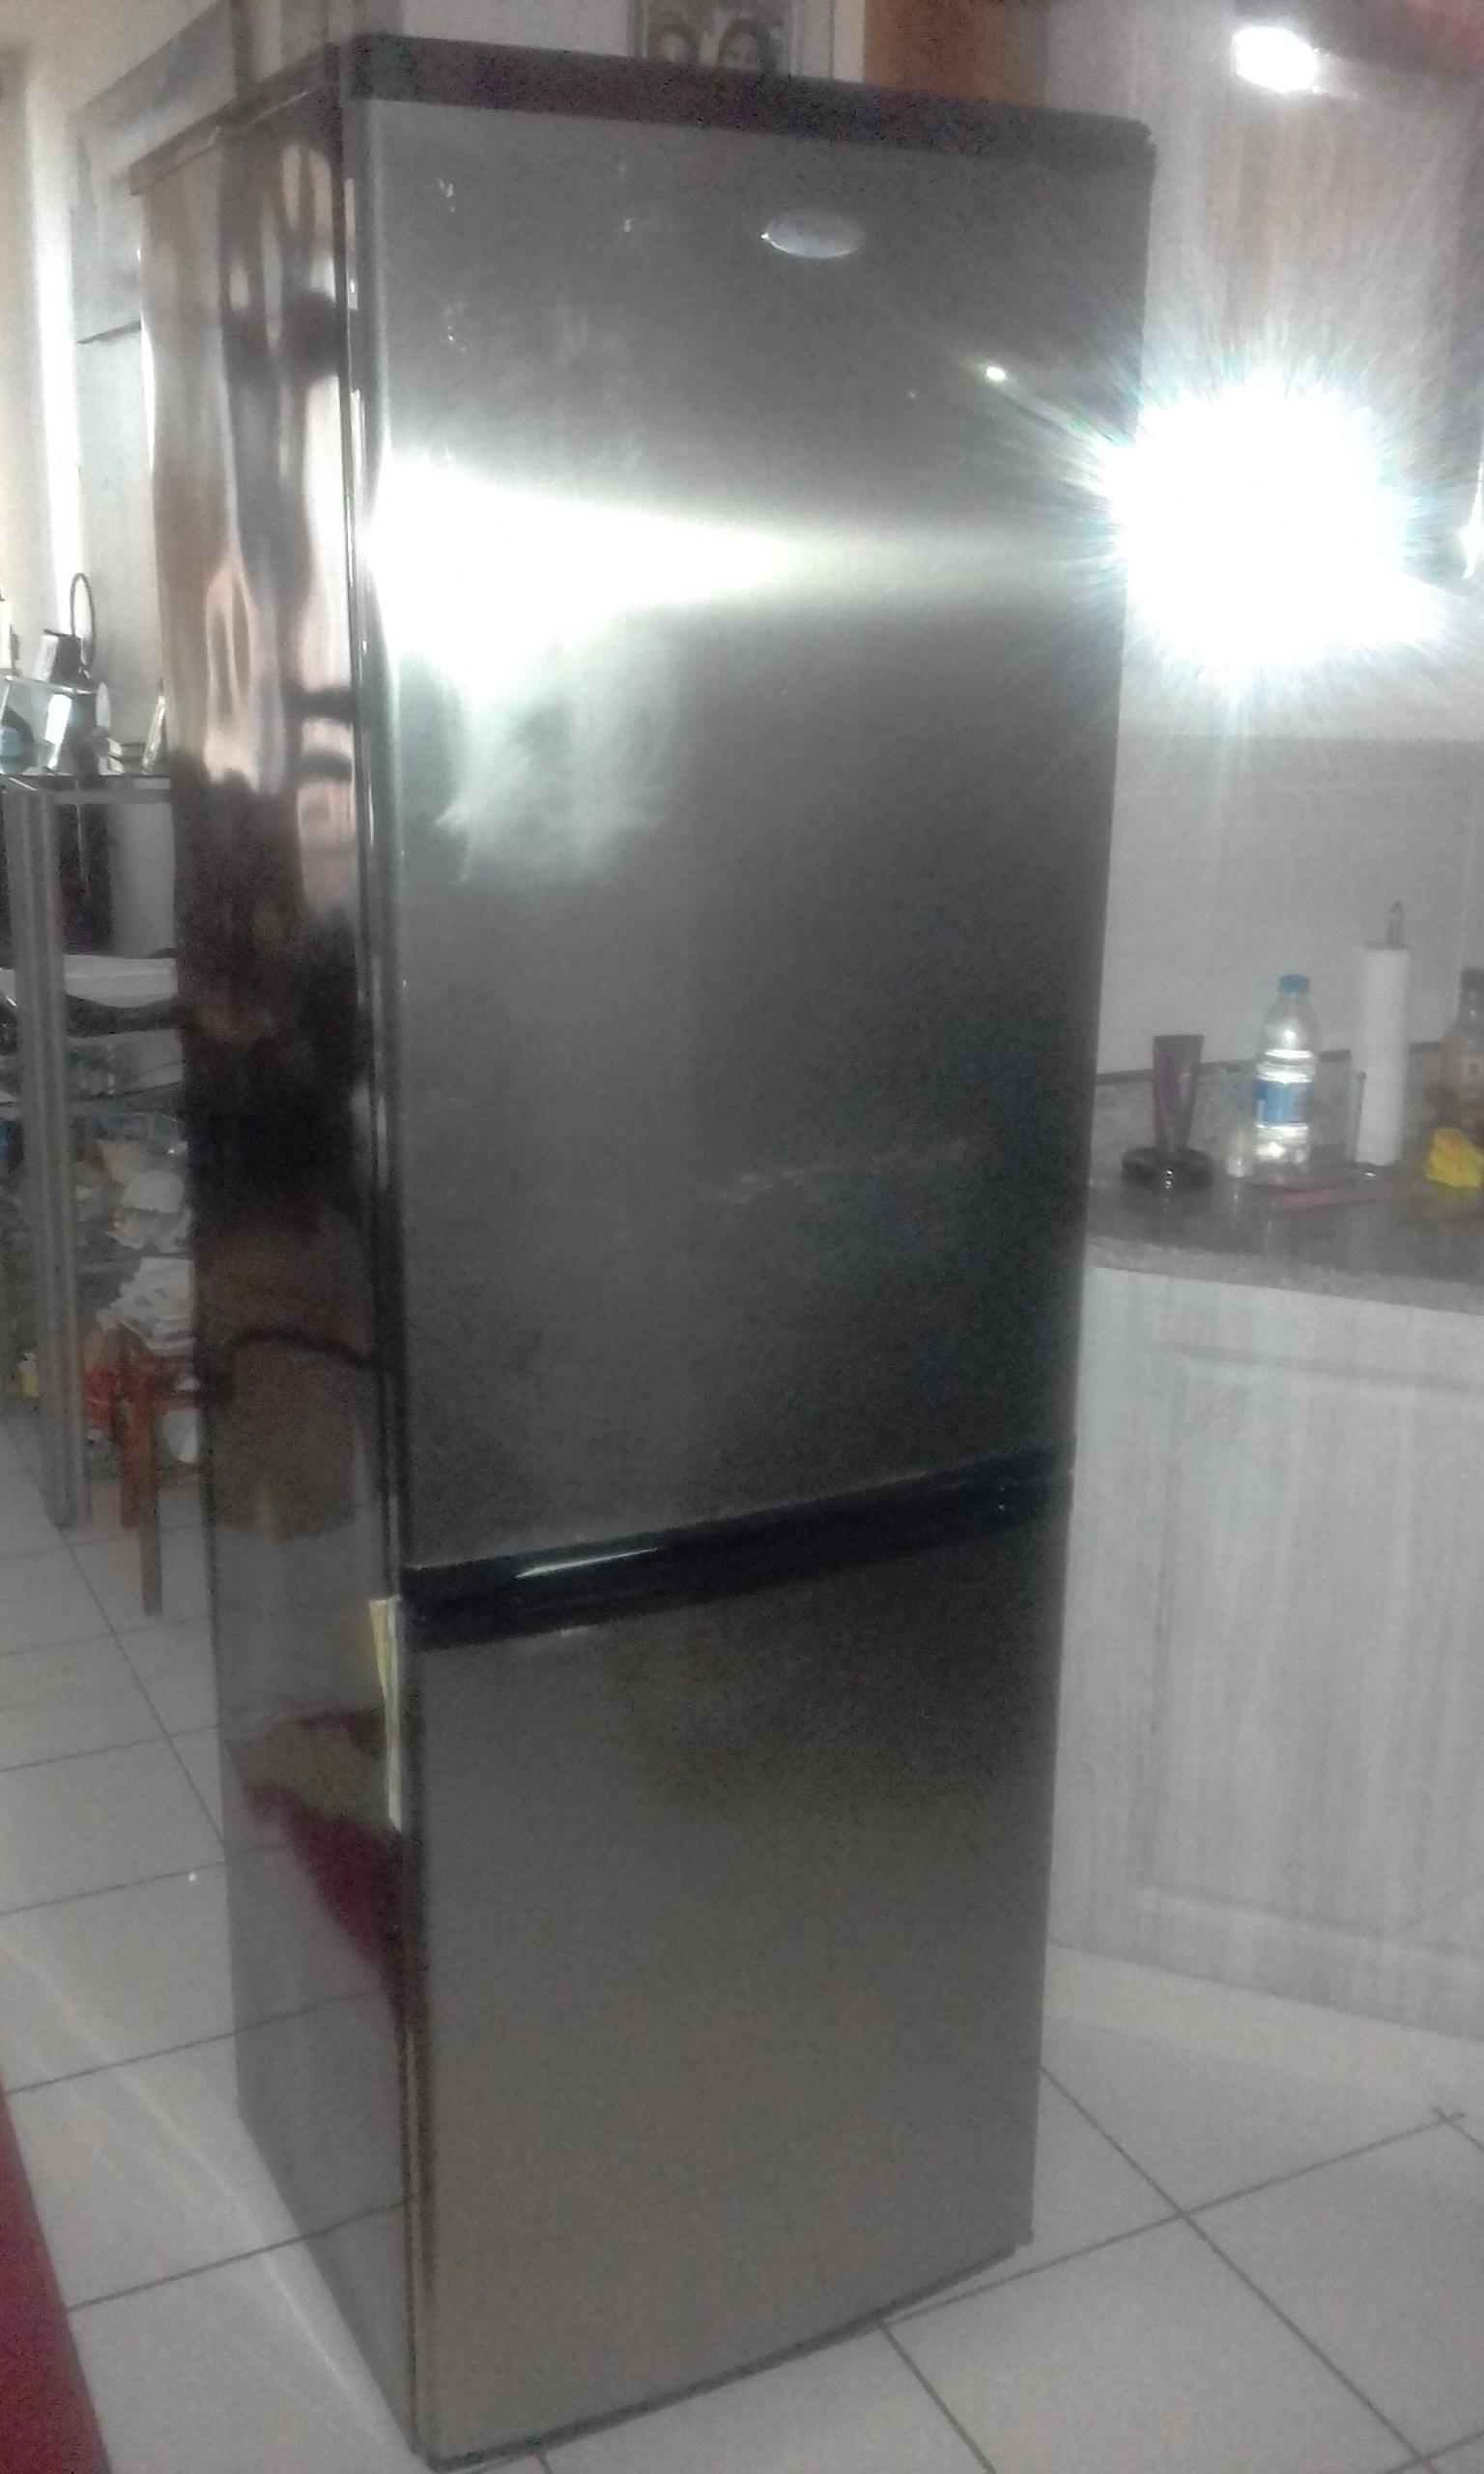 425 lt. Whirlpool bottom freezer/fridge.